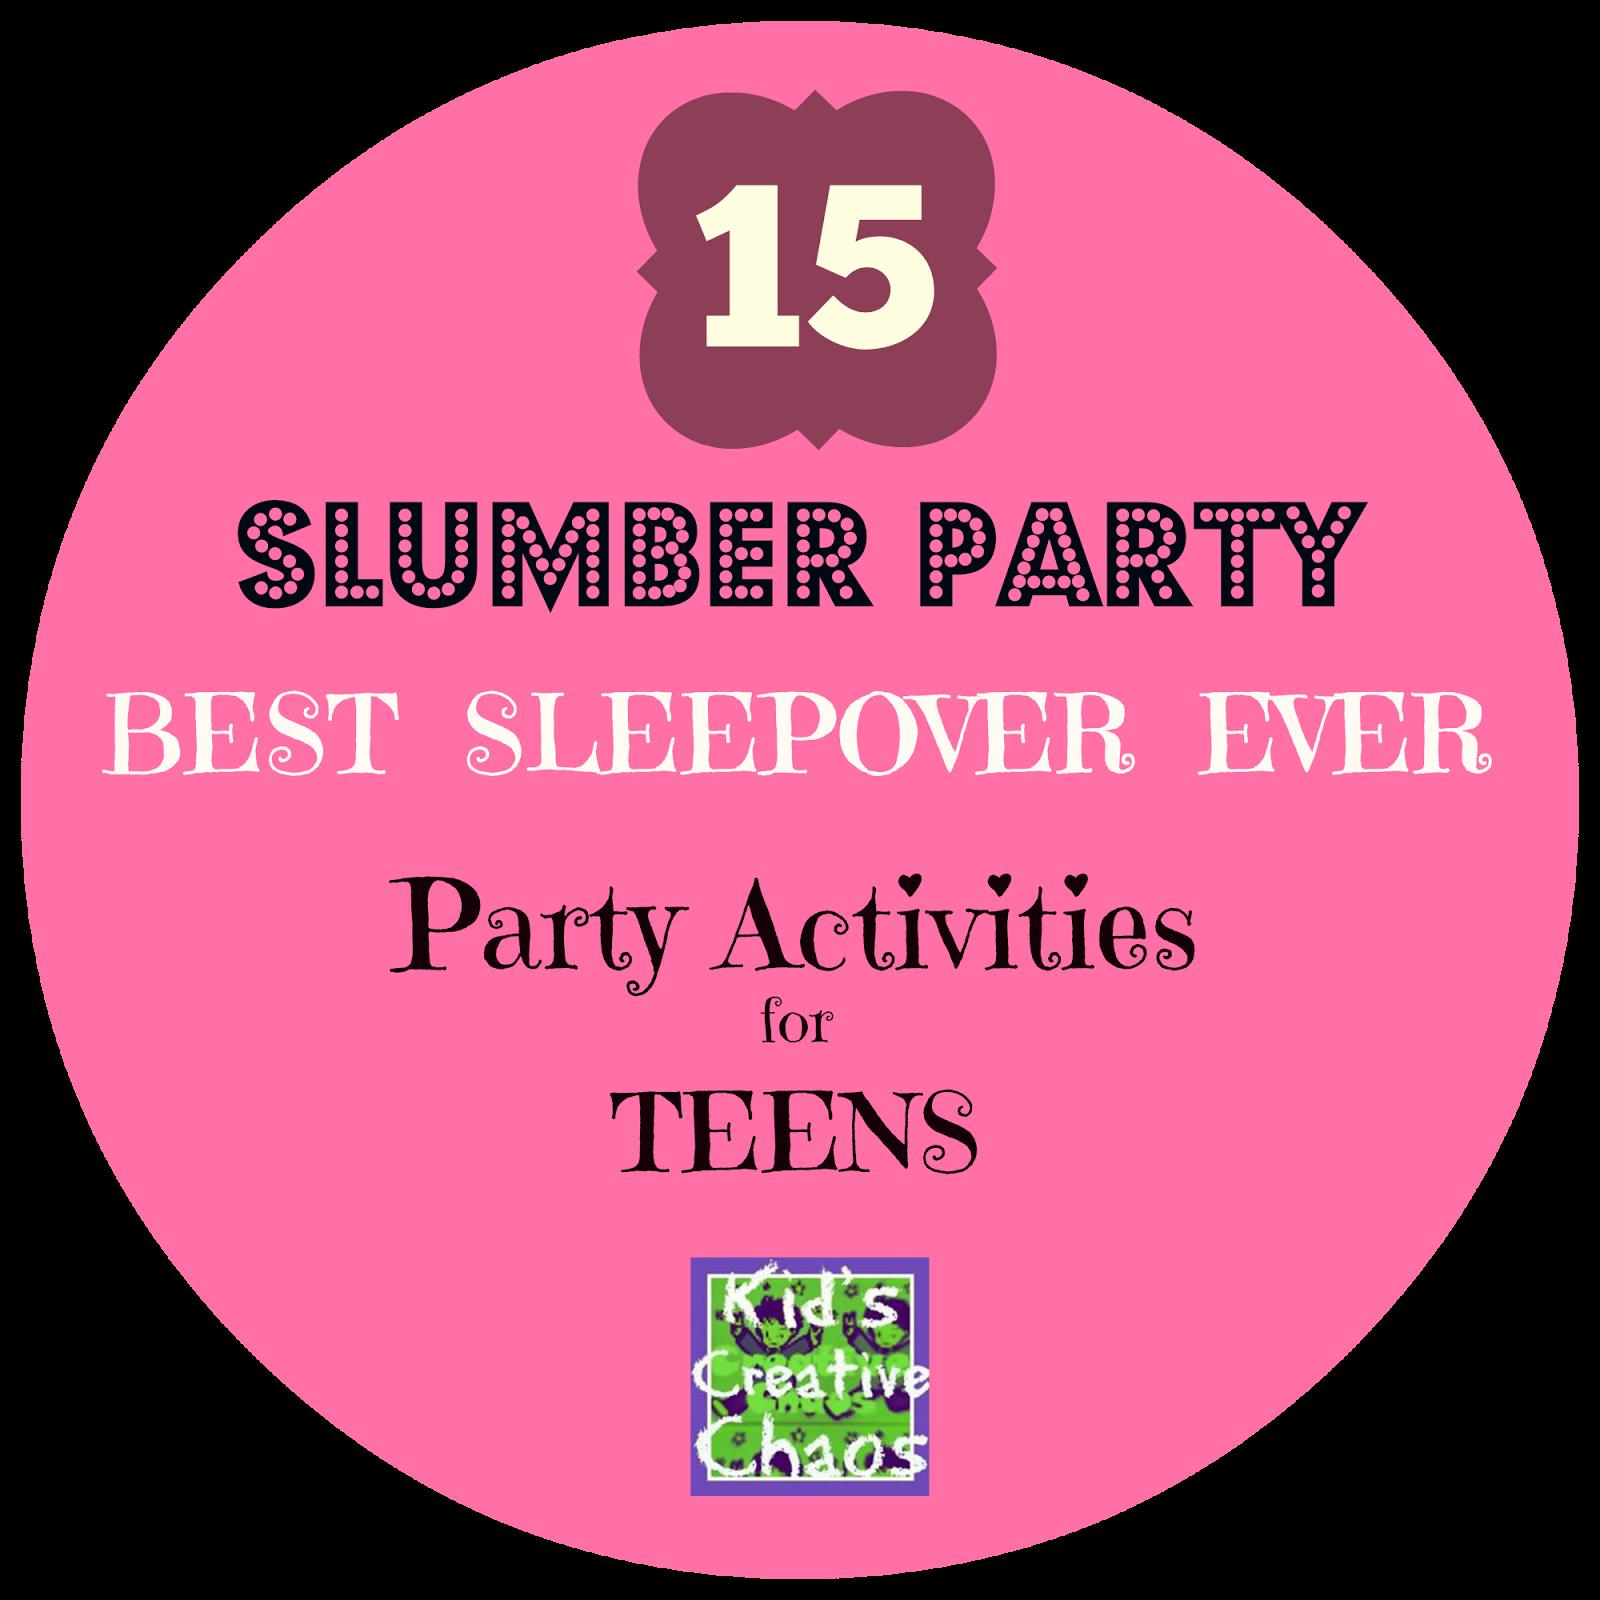 sleepover ideas girls on pinterest girl sleepover games slumber party crafts and girl sleepover. Black Bedroom Furniture Sets. Home Design Ideas